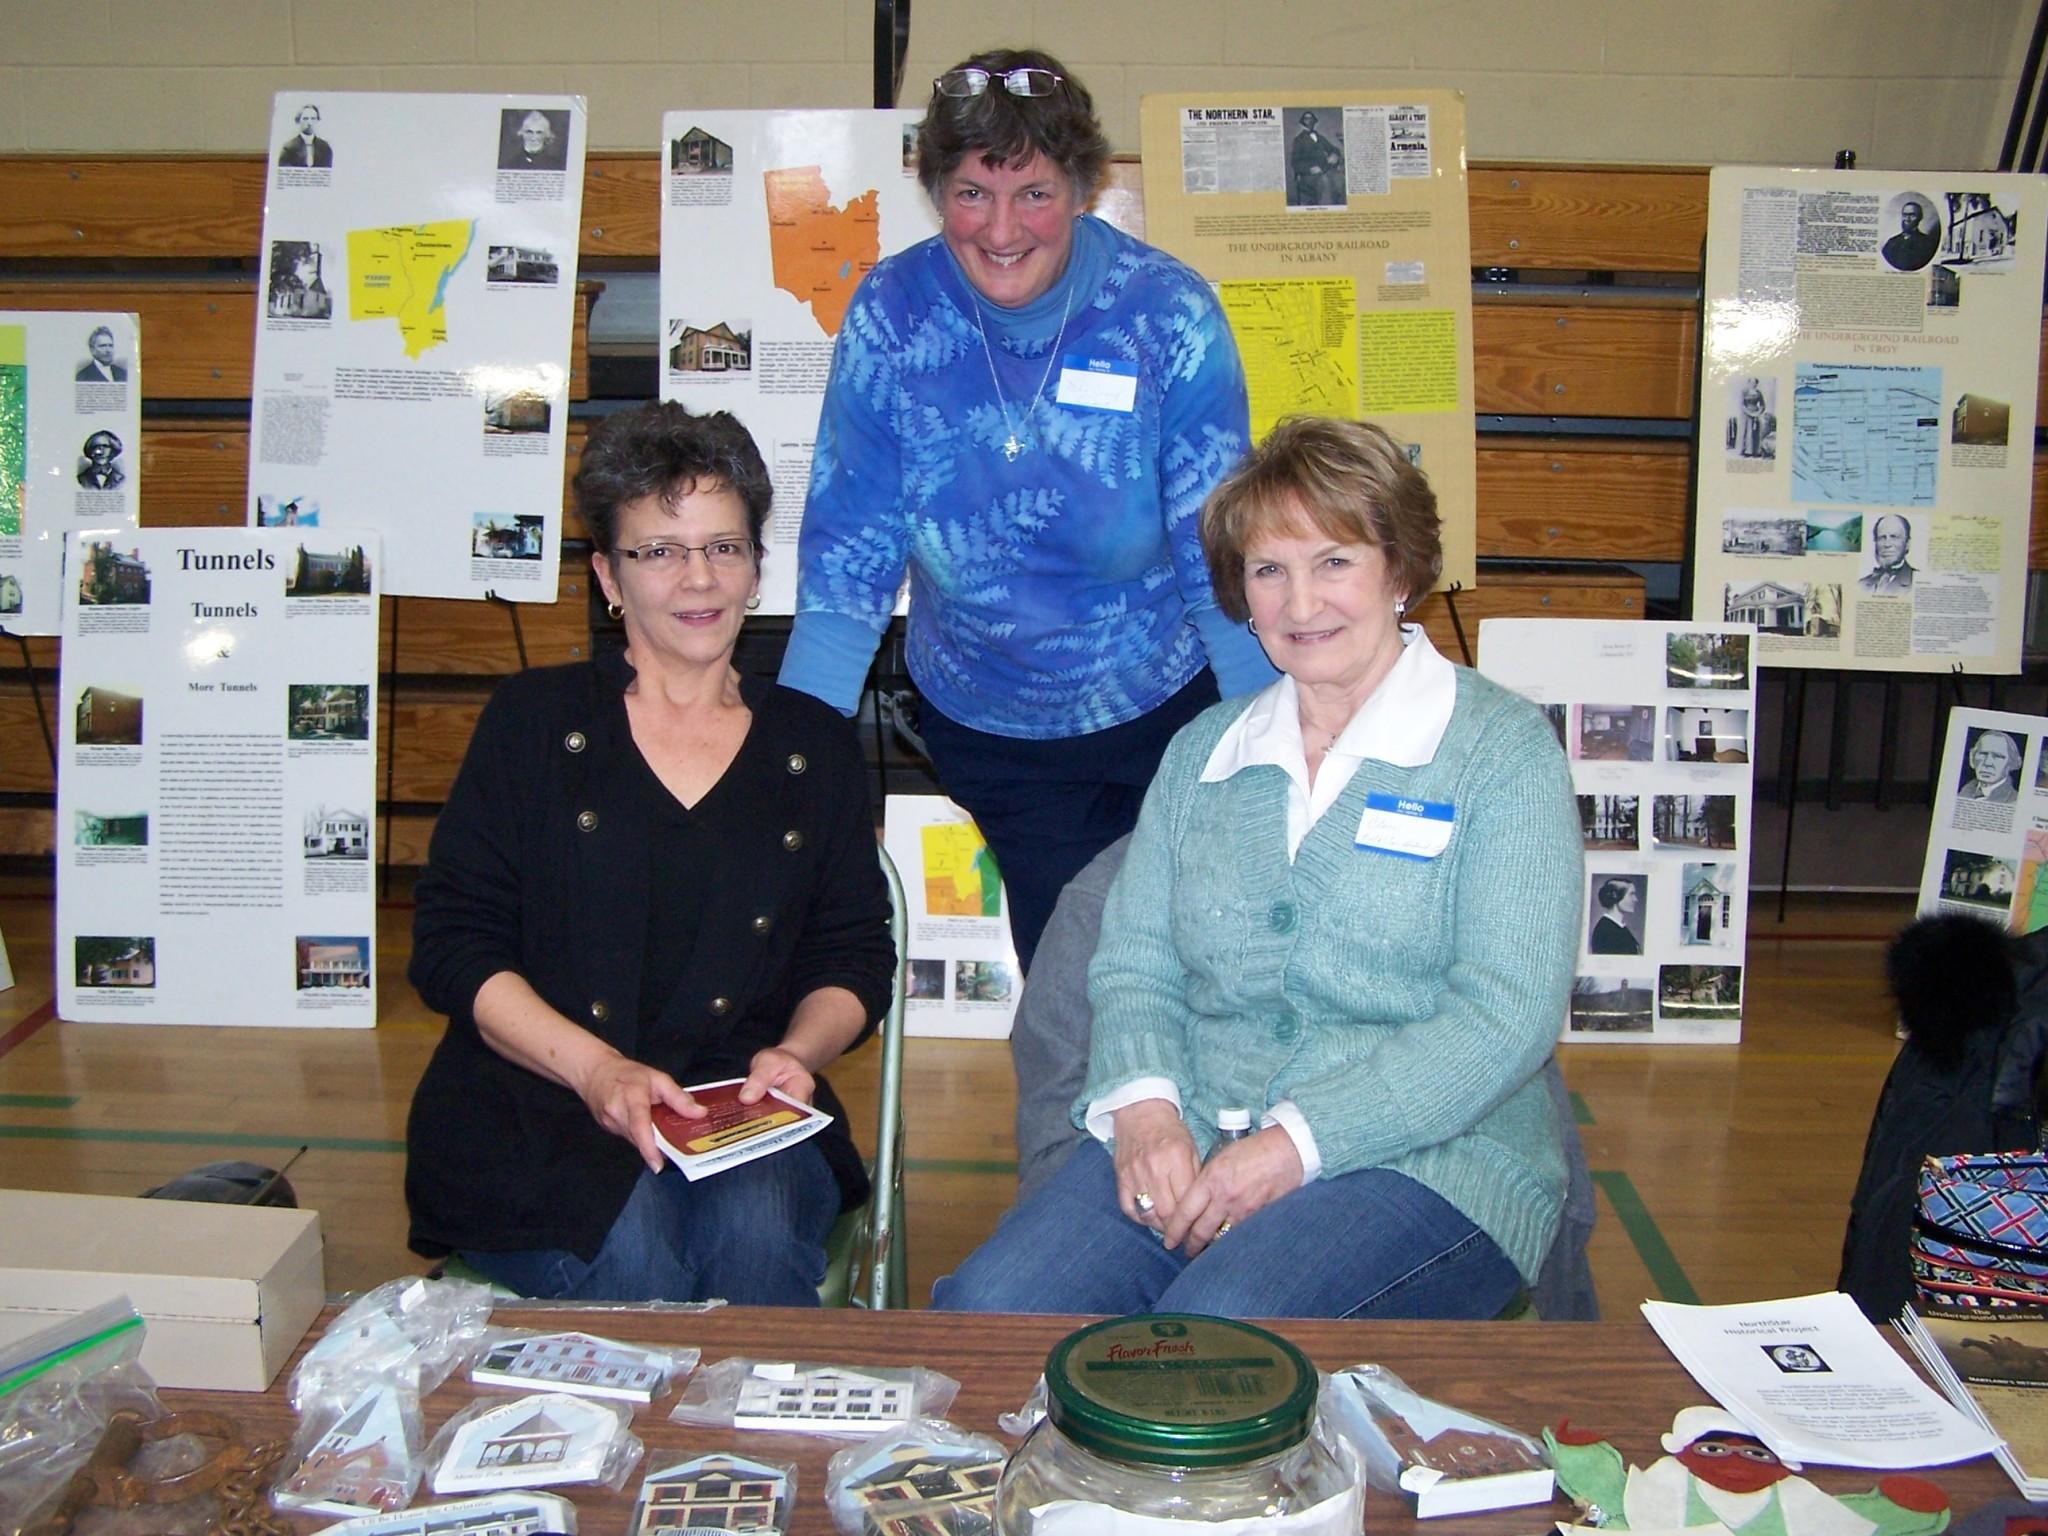 History fair Saturday in Granville